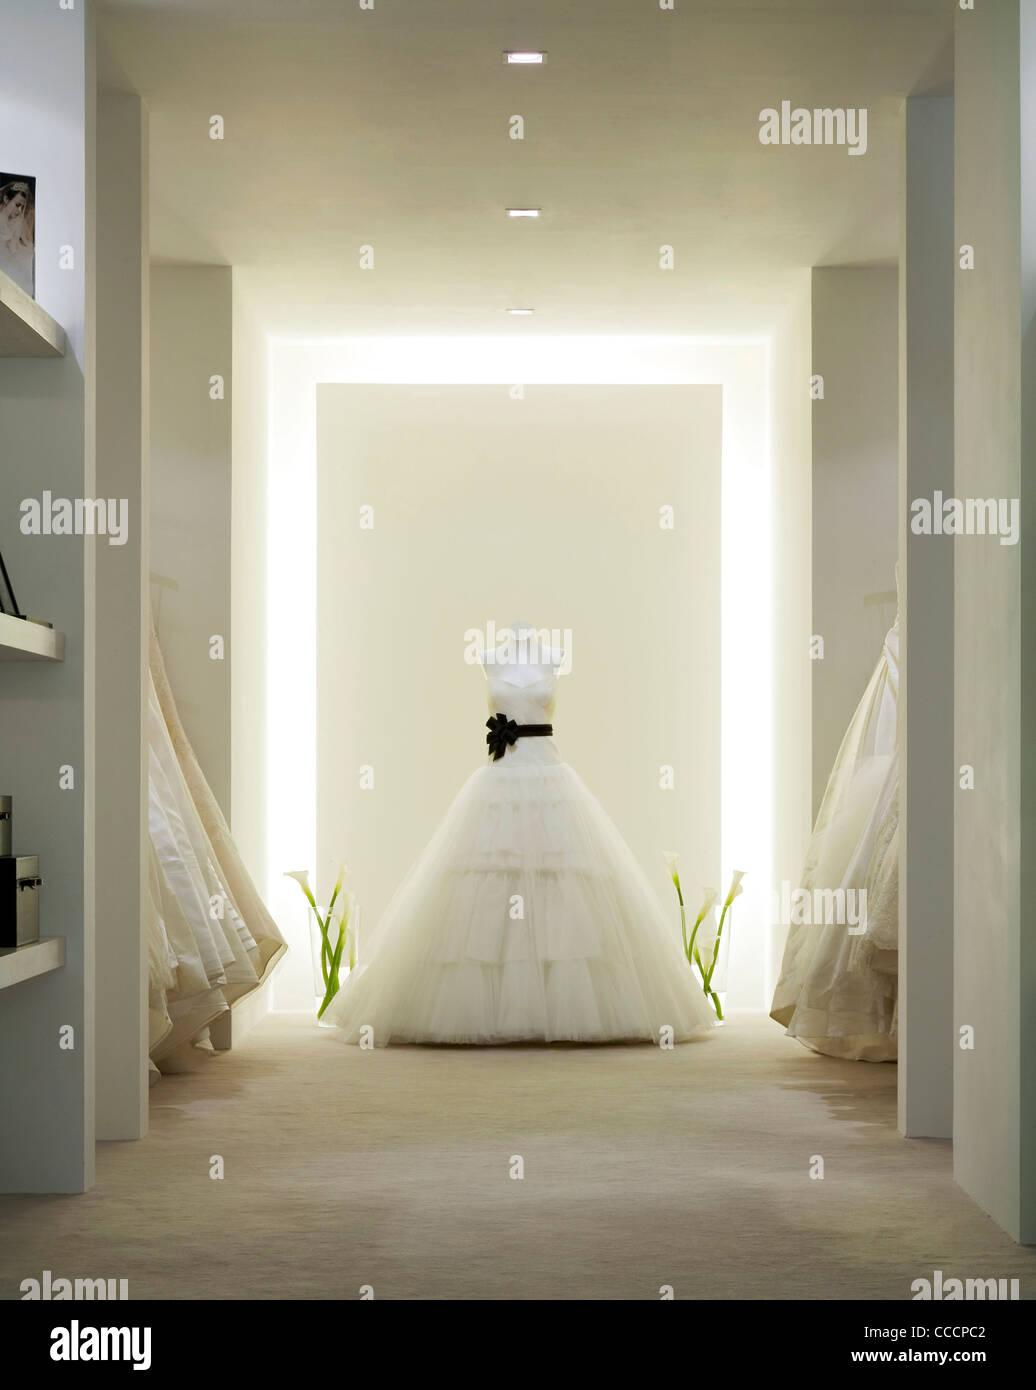 VERA WANG WEDDING SHOP SHOP INTERIOR Photo Stock